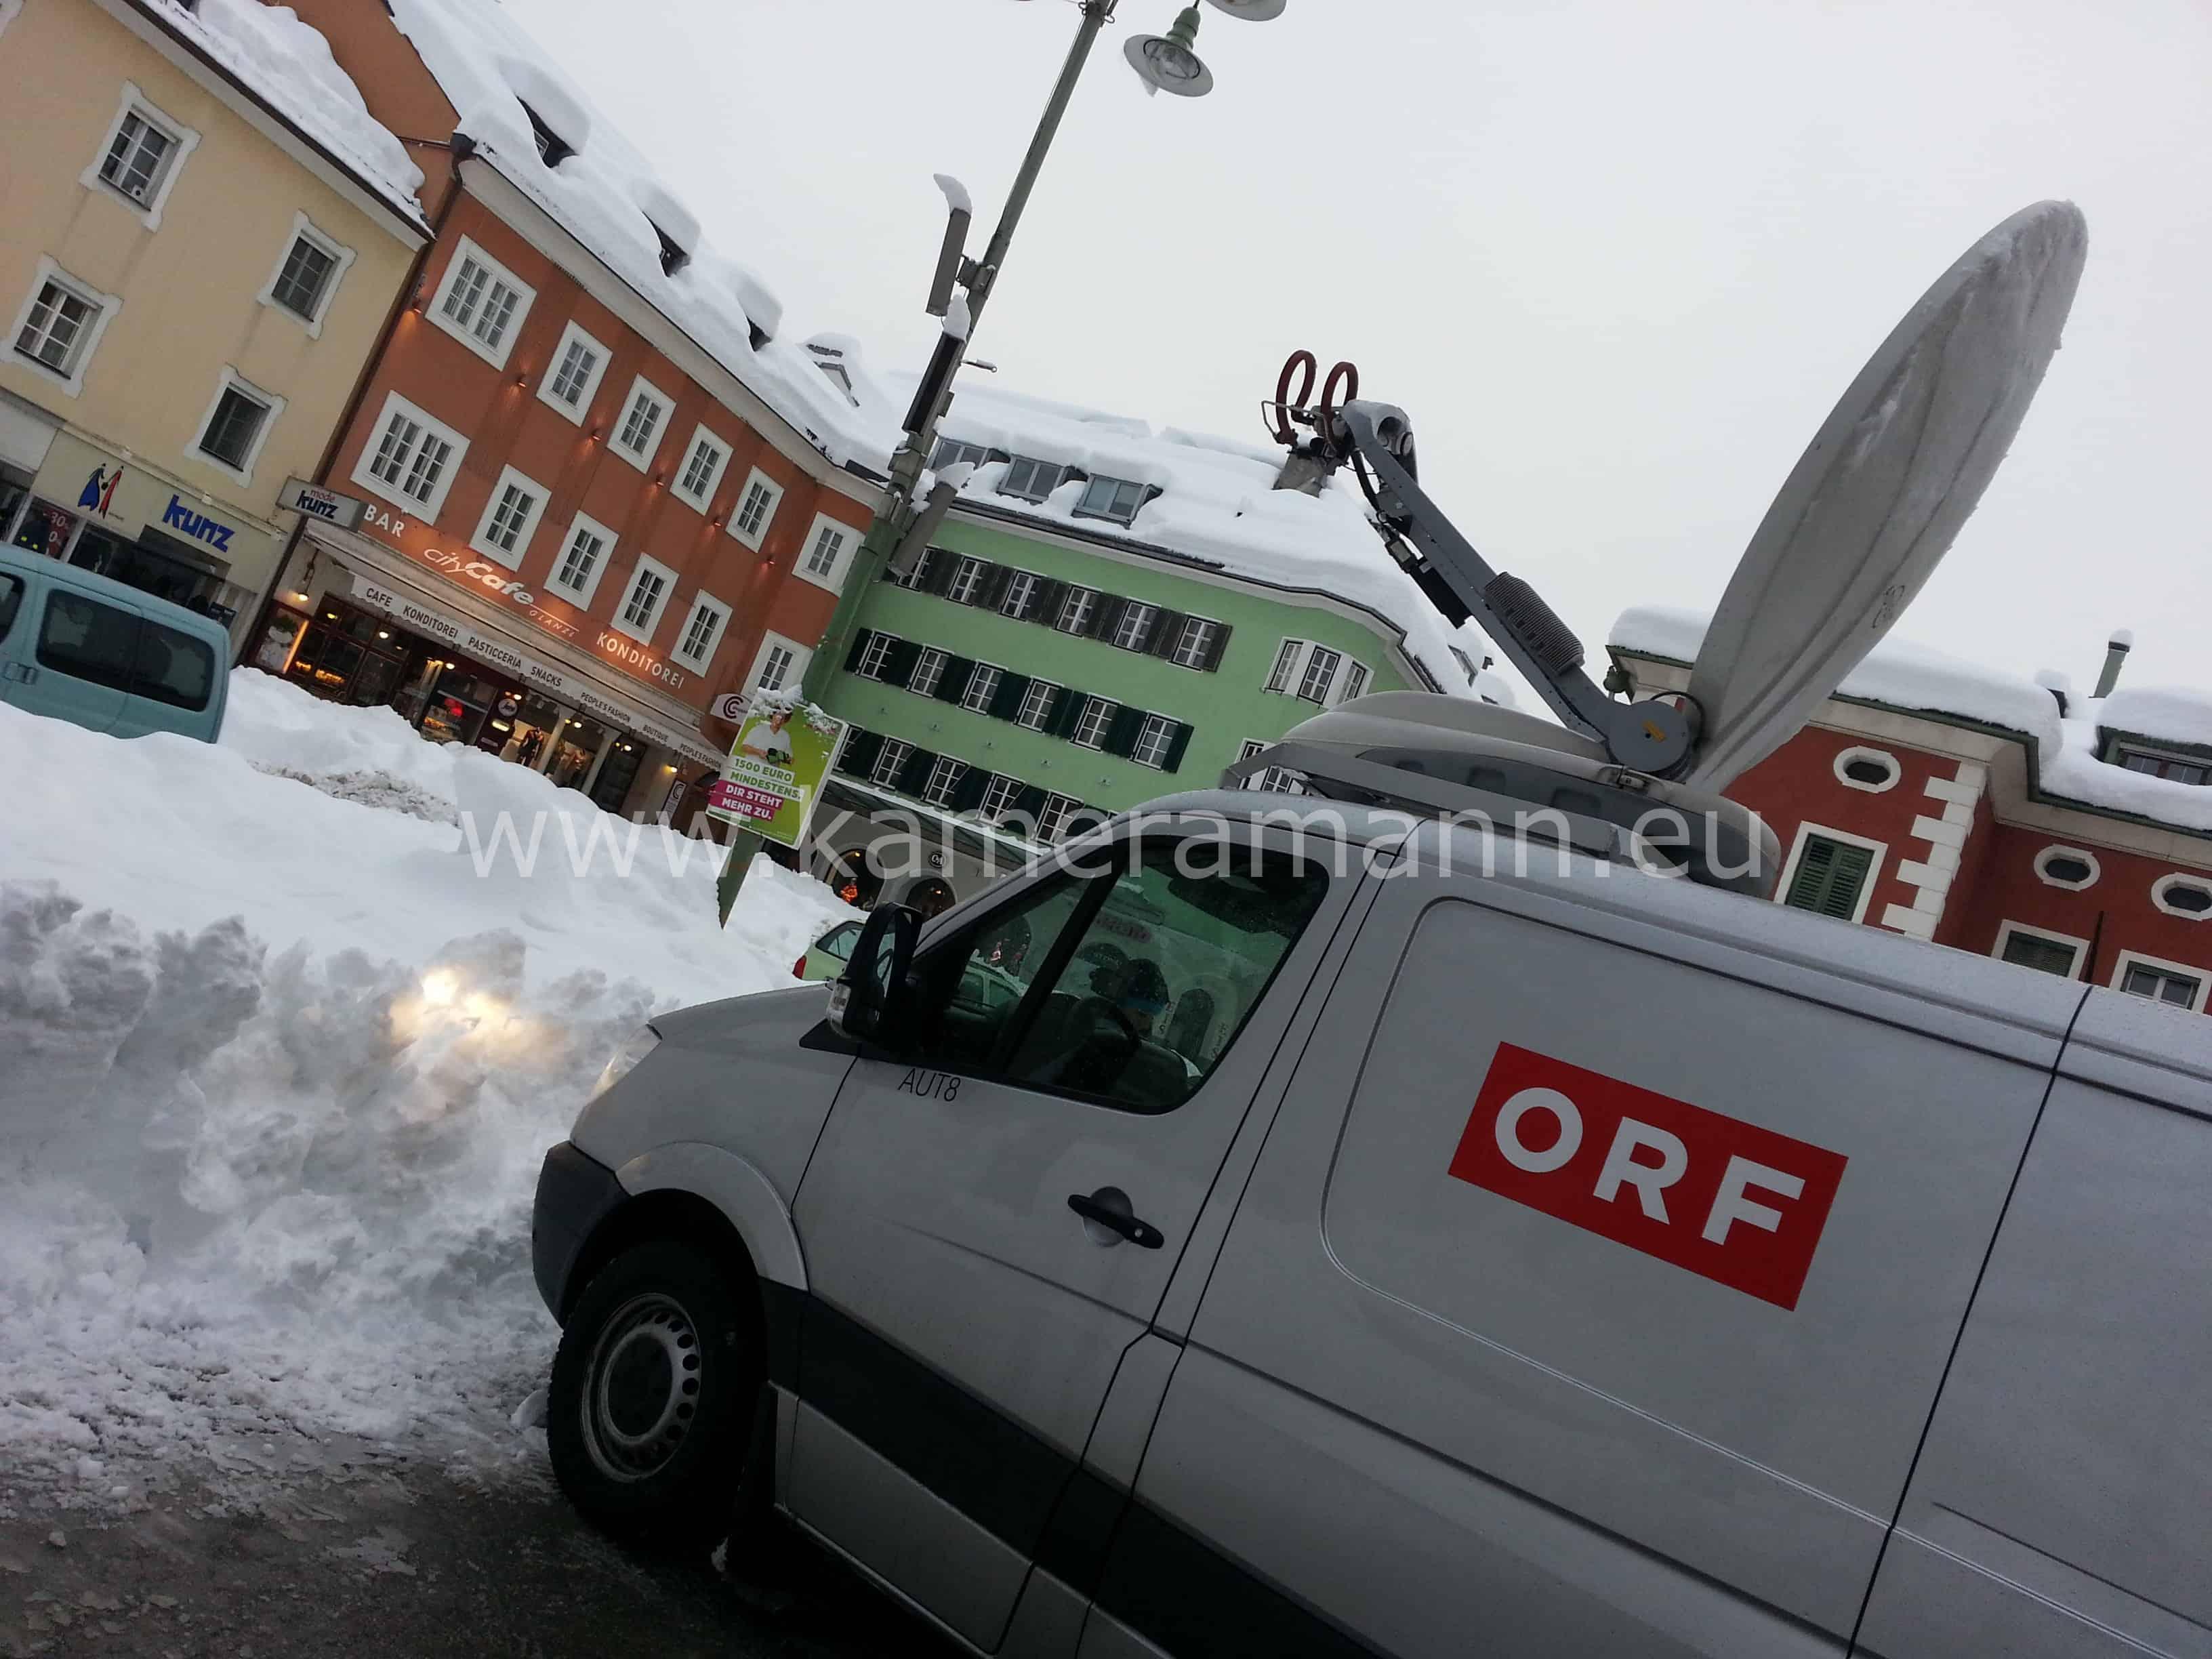 wpid 20140201 083216 - ORF Live Schneechaos